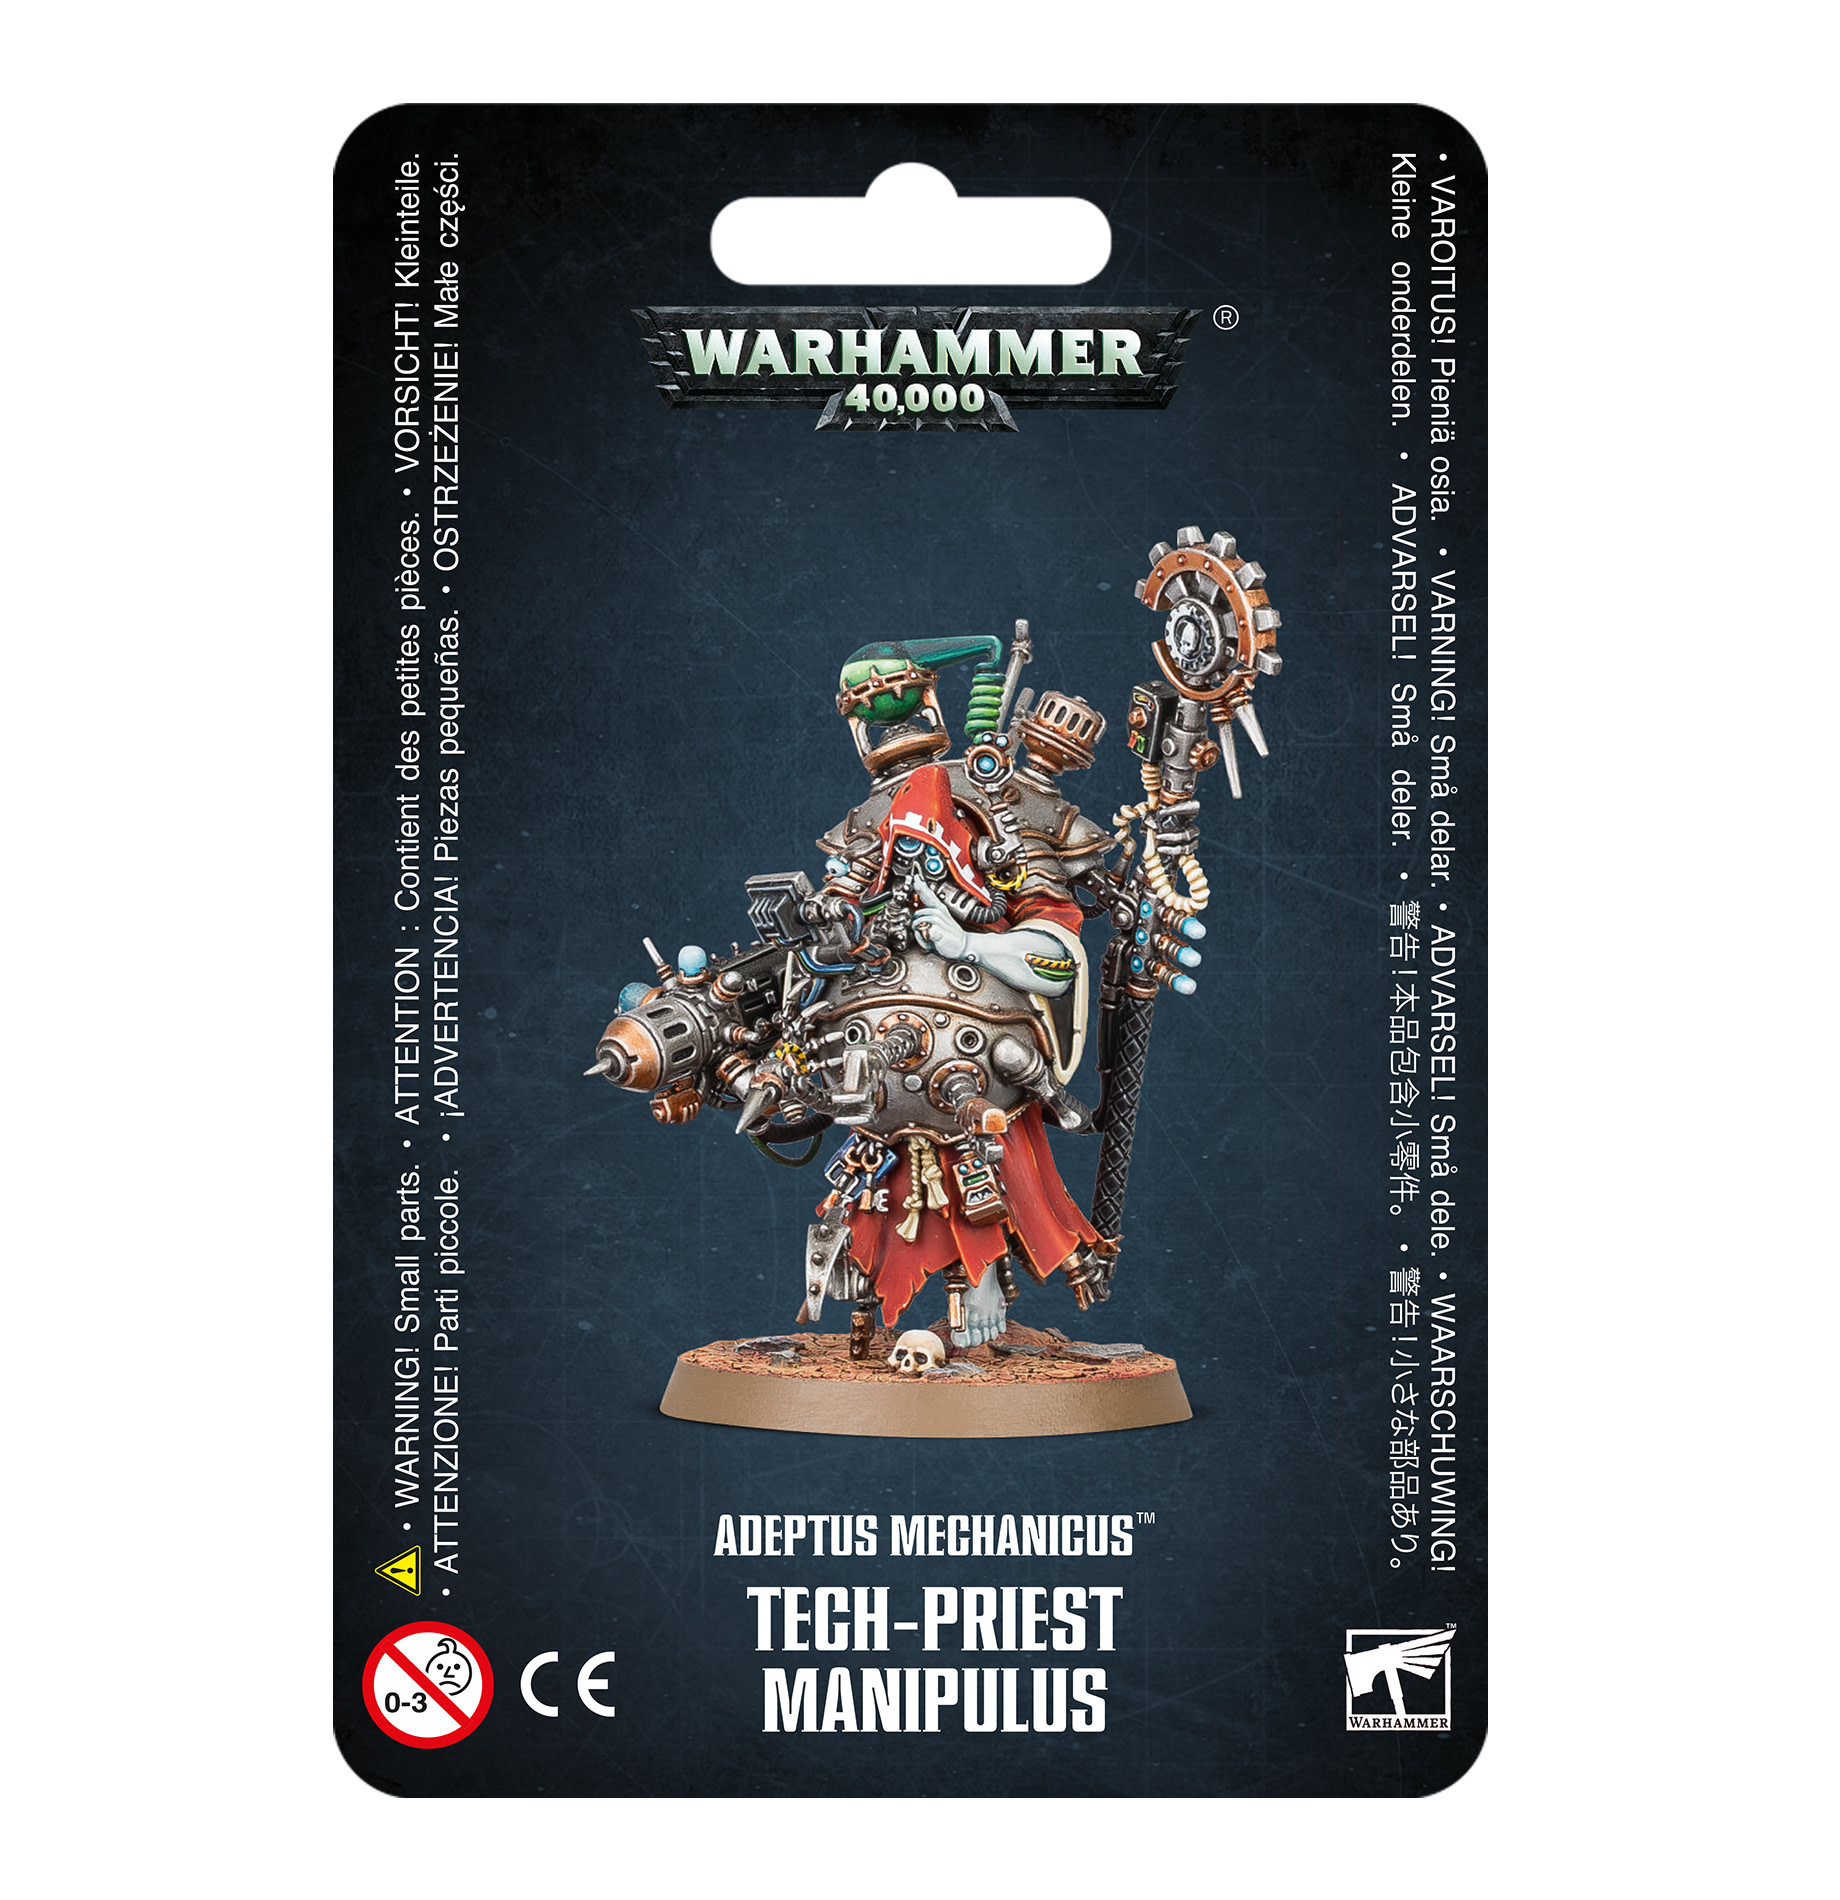 Warhammer 40k ADEPTUS MECHANICUS TECH-PRIEST MANIPULUS